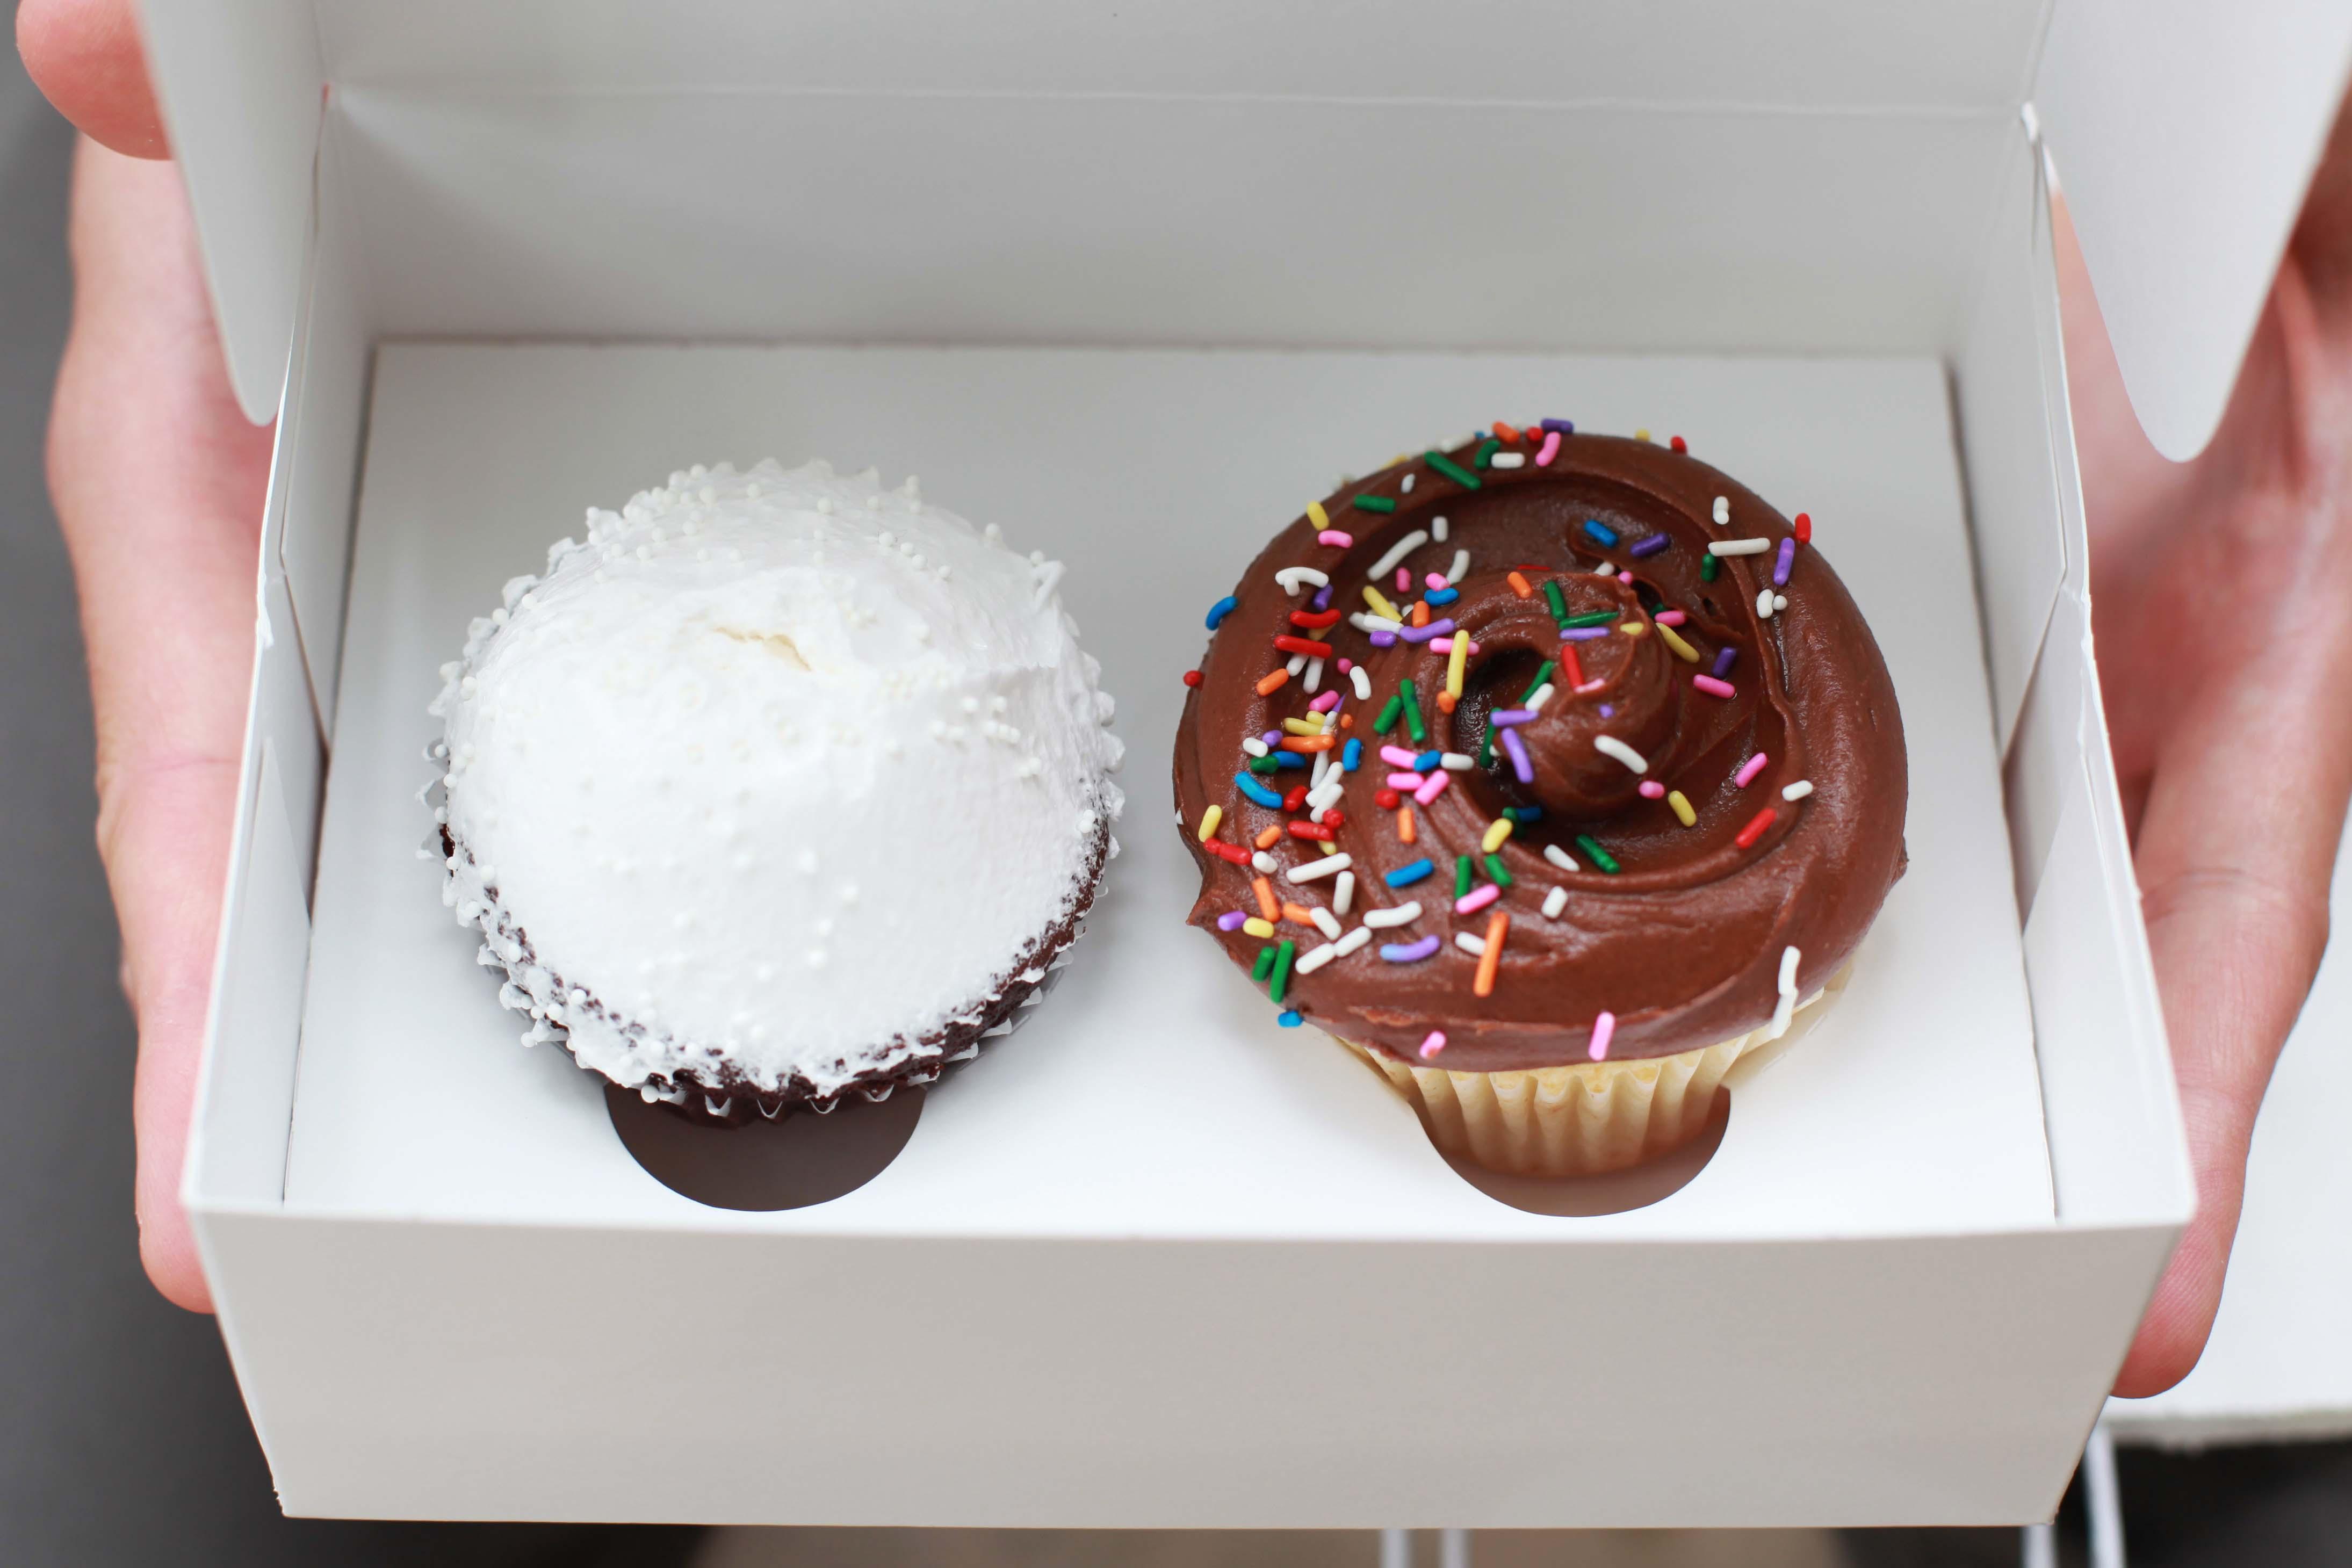 Cupcake Magnolia Bakery